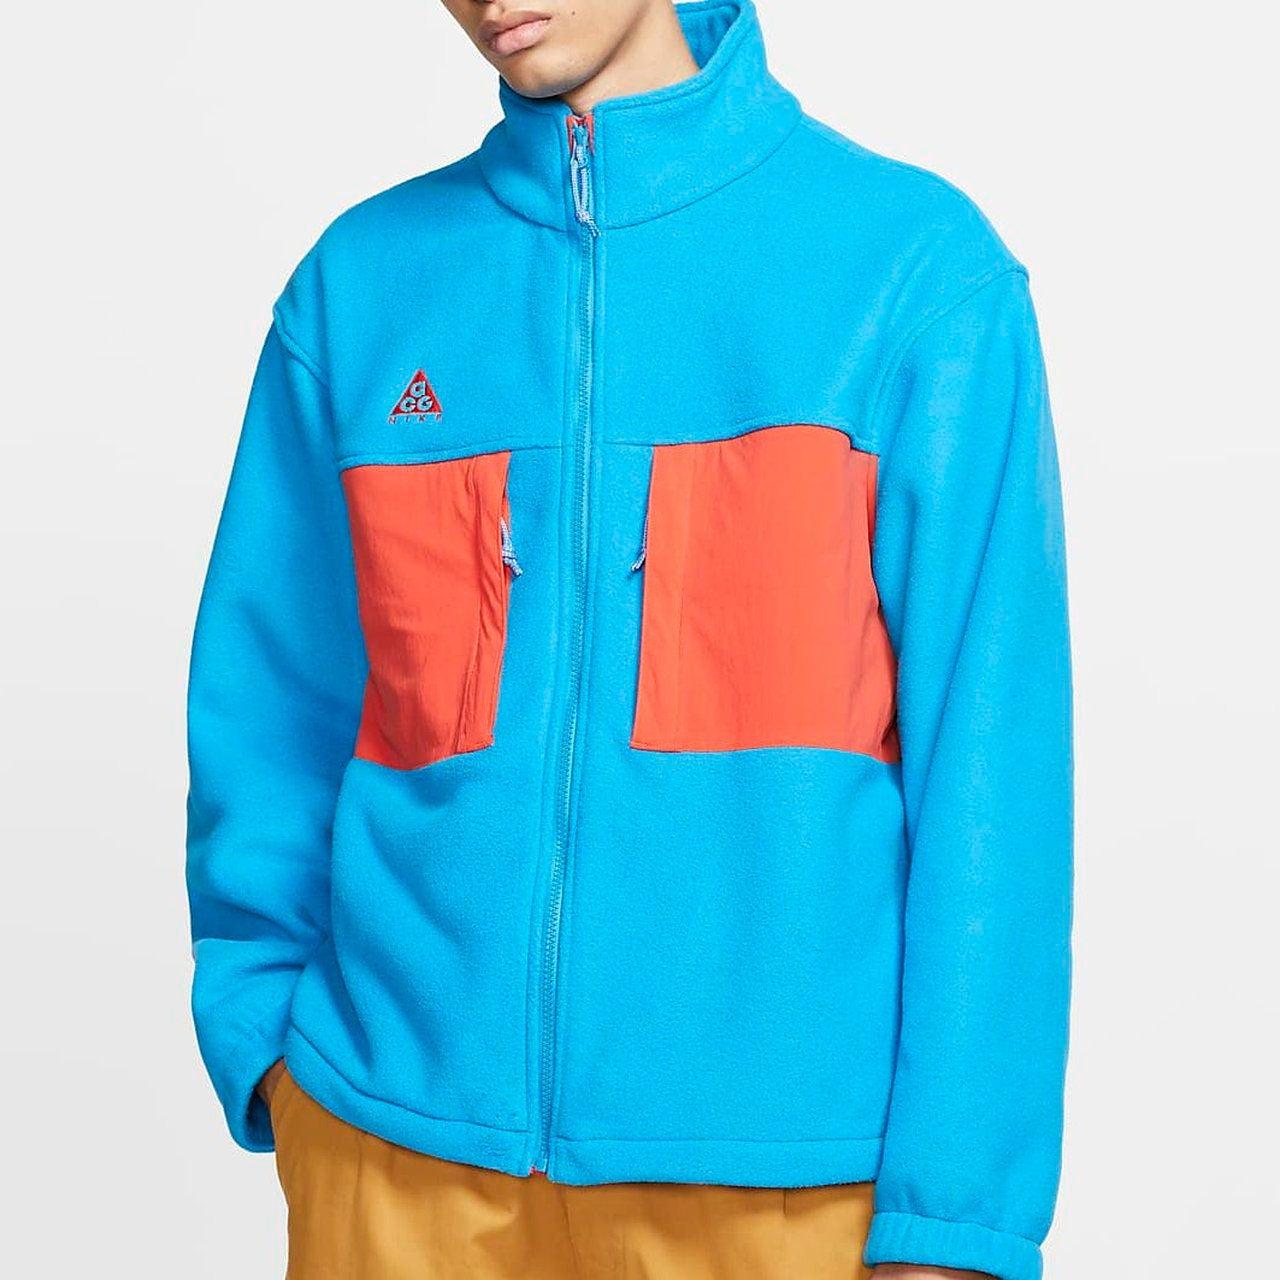 NWT NIKE ACG MICROFLEECE Sweater Jacket